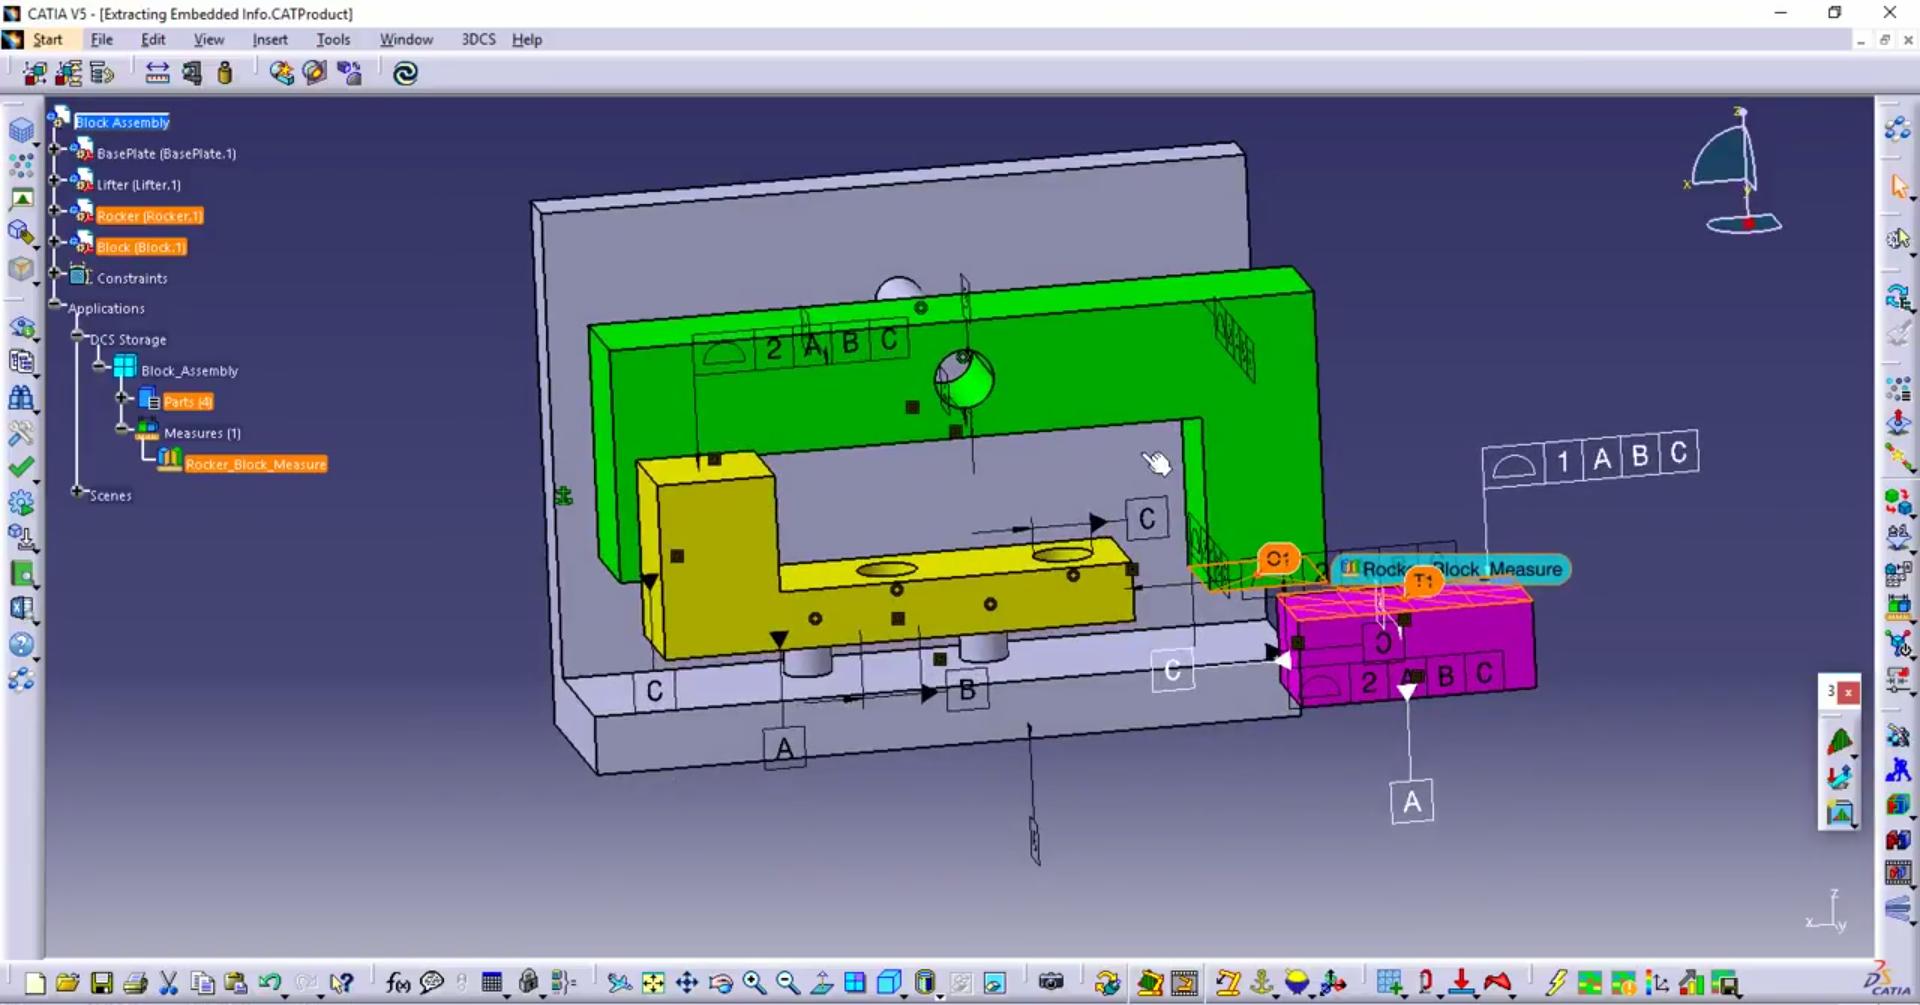 3dcs-efficiency-workshop-extract-joints-constraints-catia.png